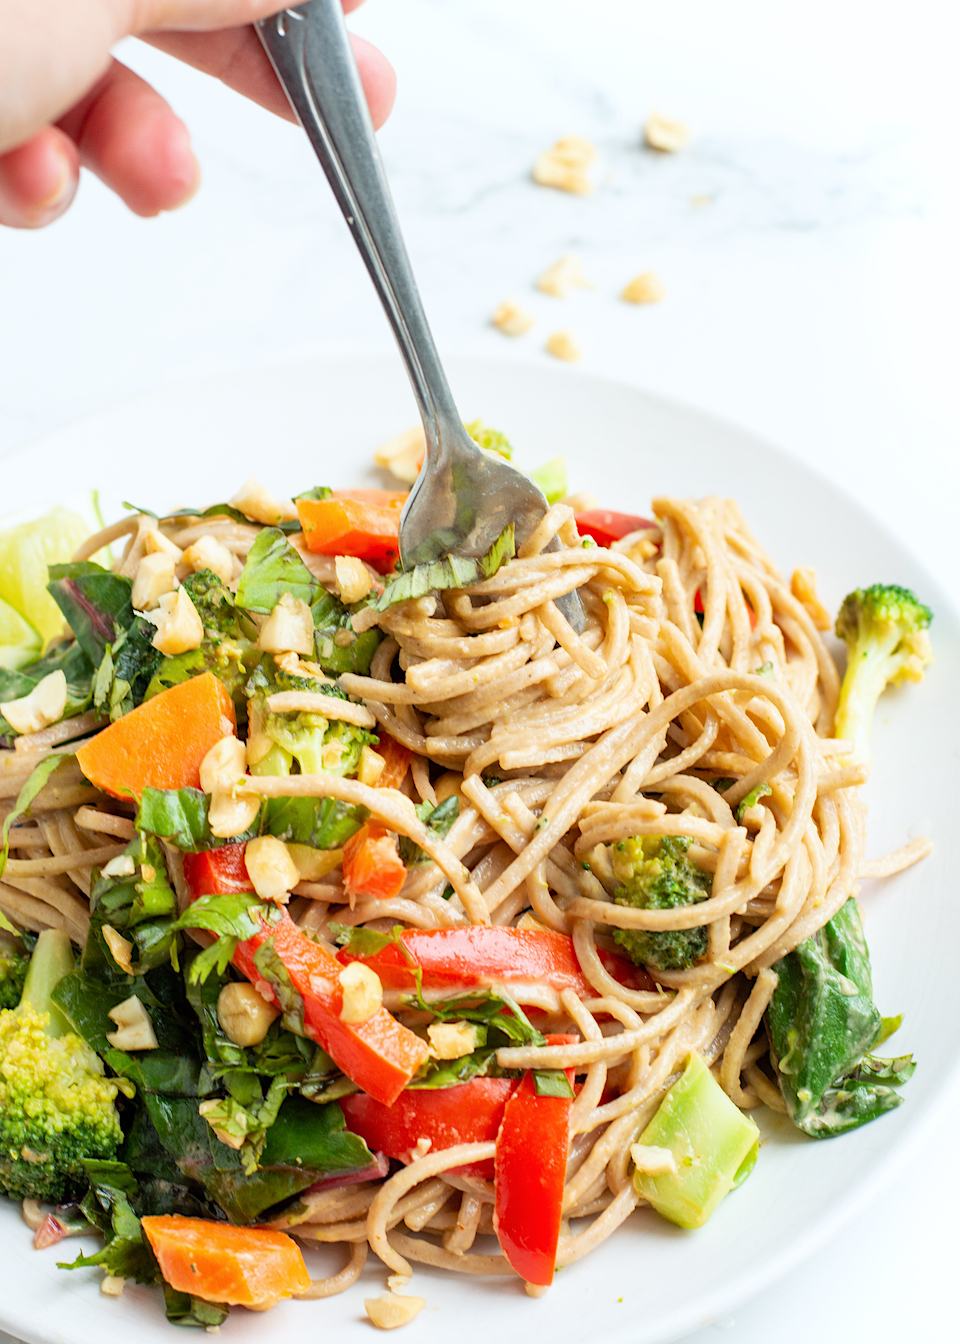 Easy Peanut Noodles with Veggies